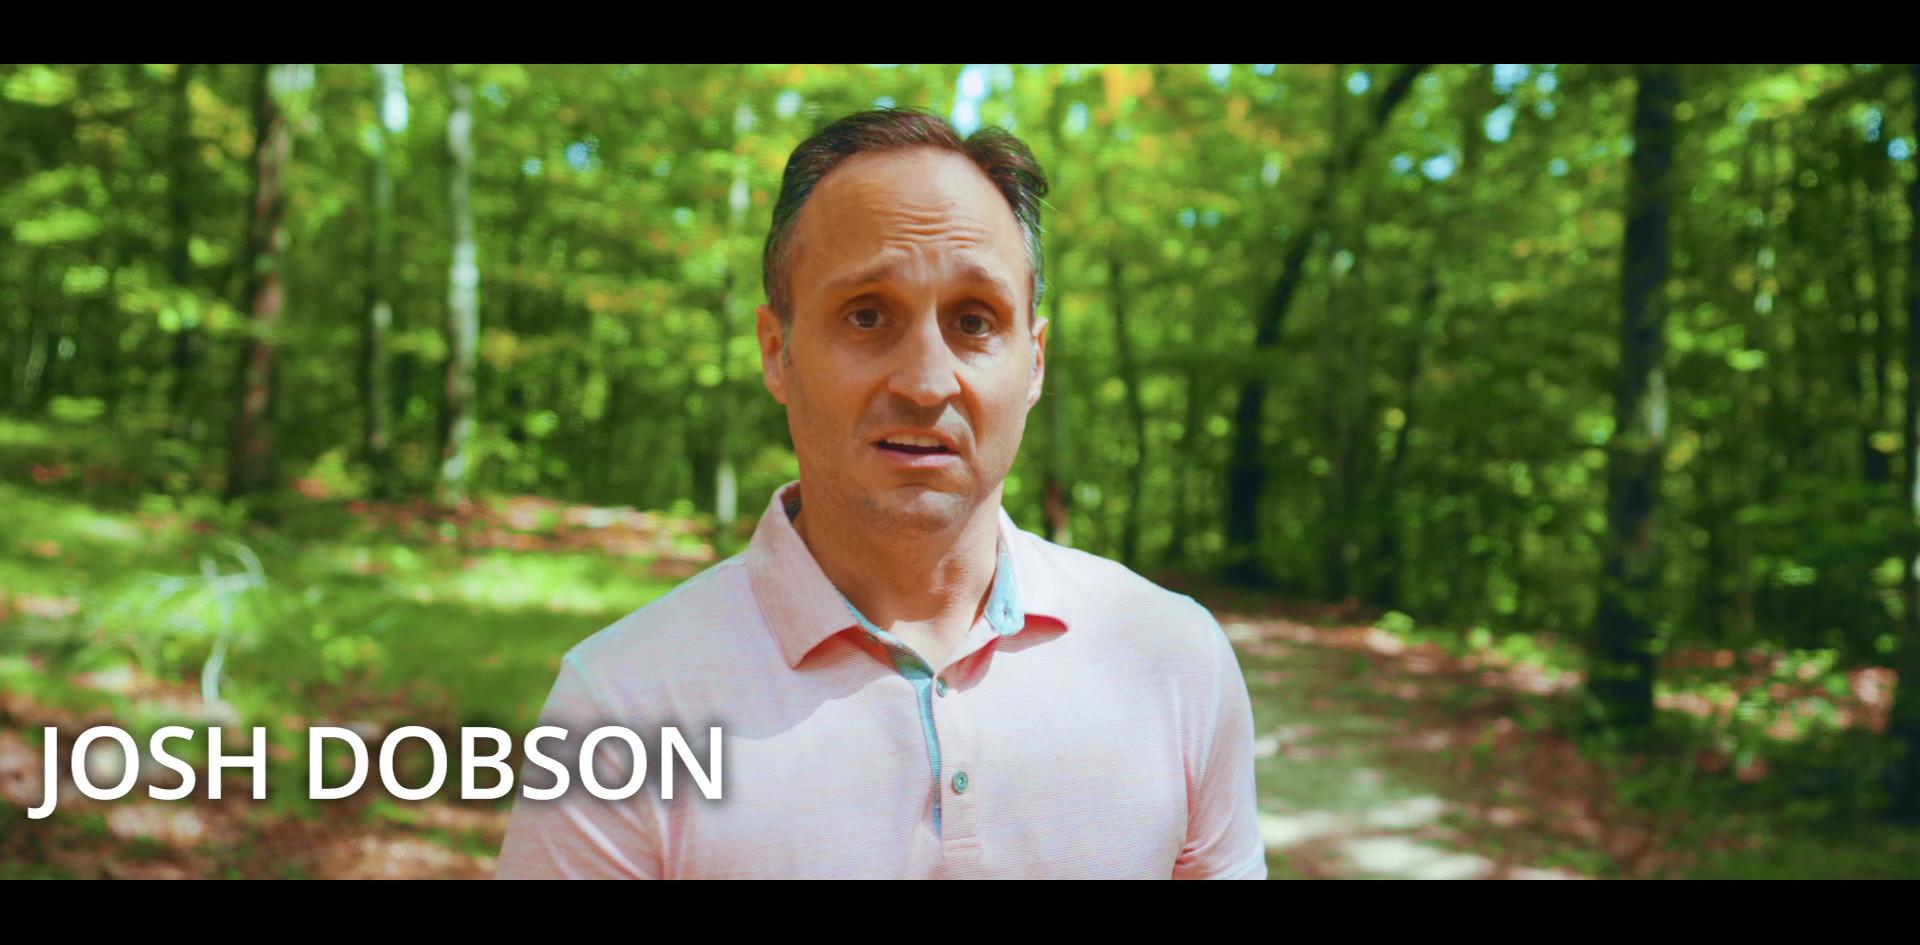 Josh Dobson: Walk in the Woods